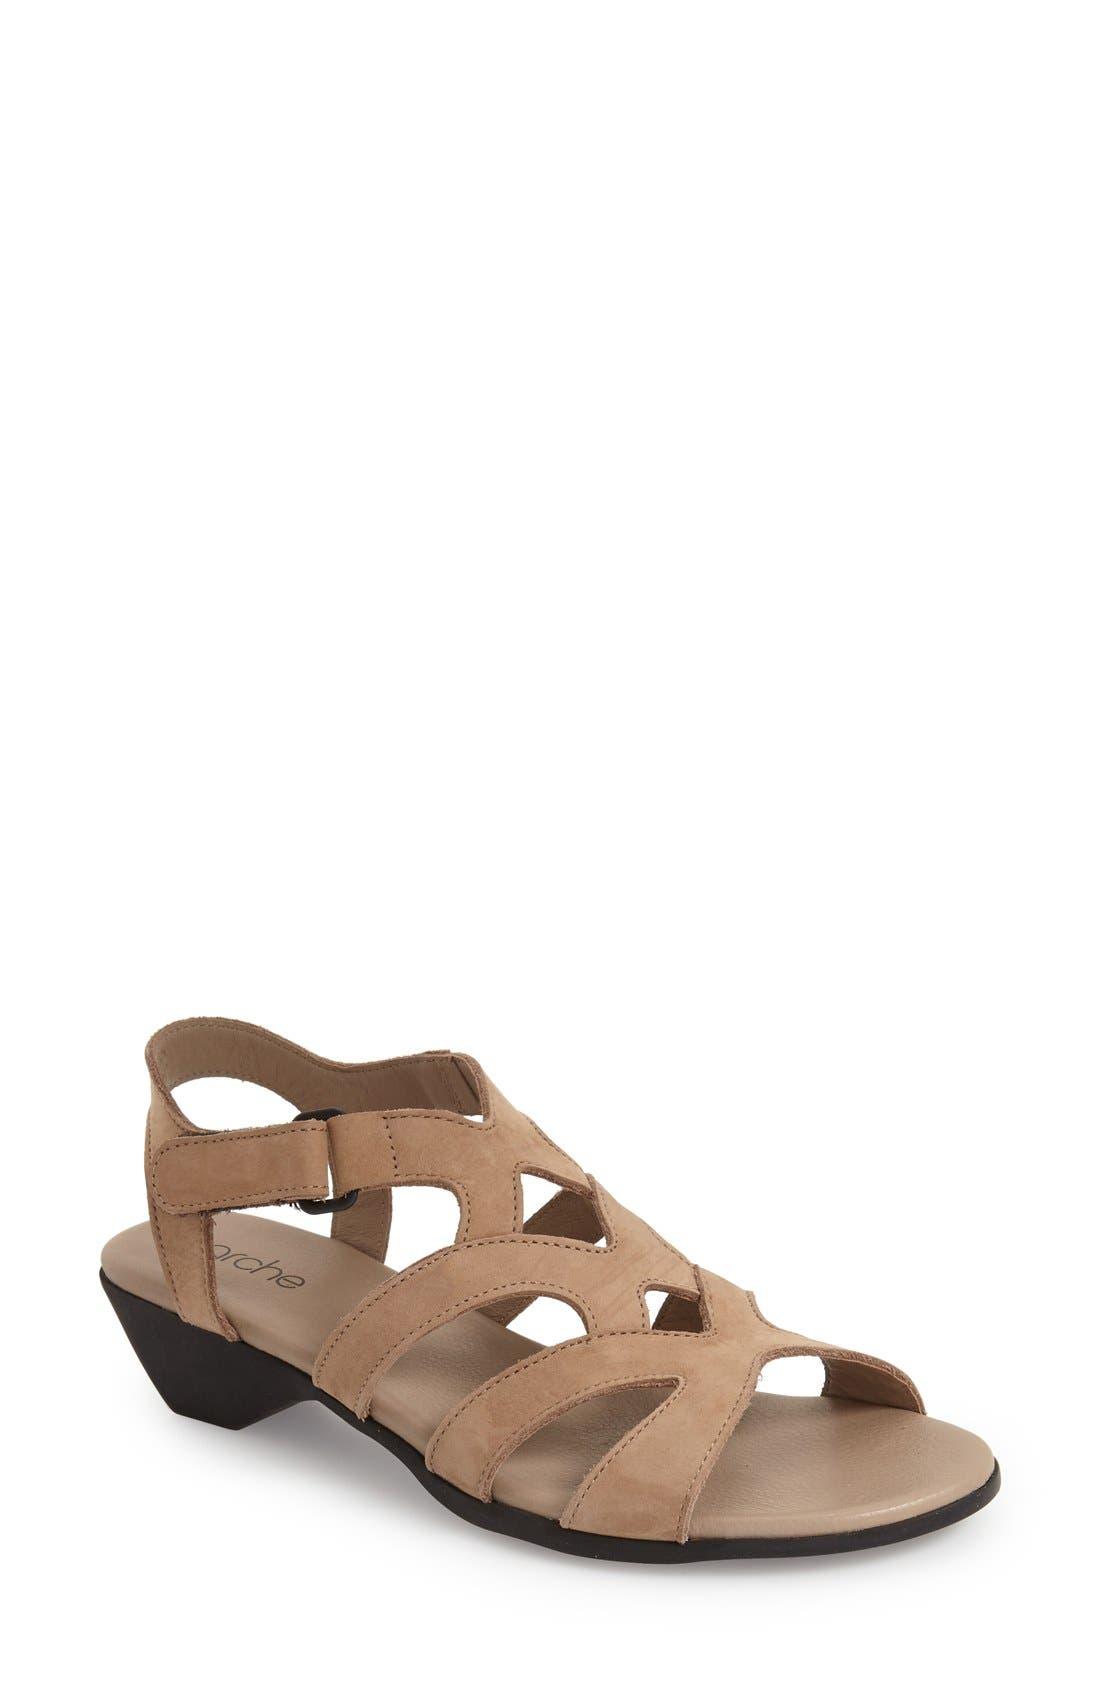 'Obela' Water Resistant Leather Sandal,                             Main thumbnail 4, color,